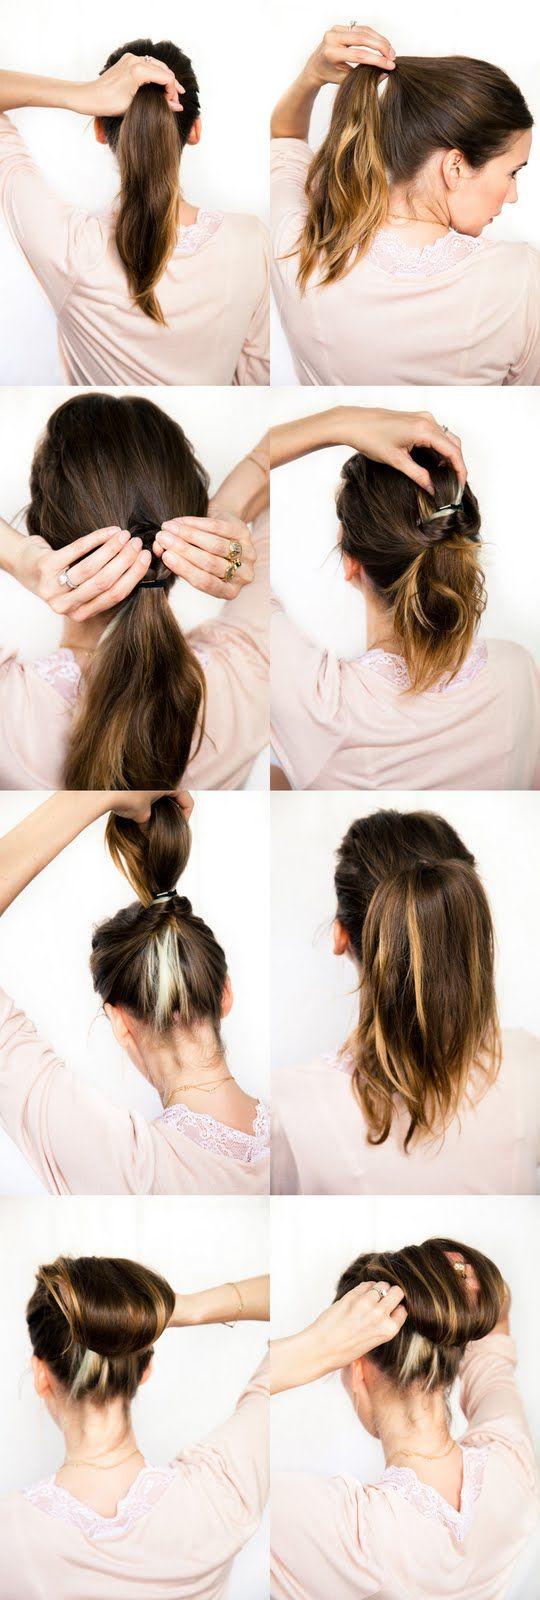 Cup Of Jo Chestnut Bun Hair Tutorial Wedding How To Do Your Own Wedding Hair Di Hair Styles Diy Wedding Hair Long Hair Styles